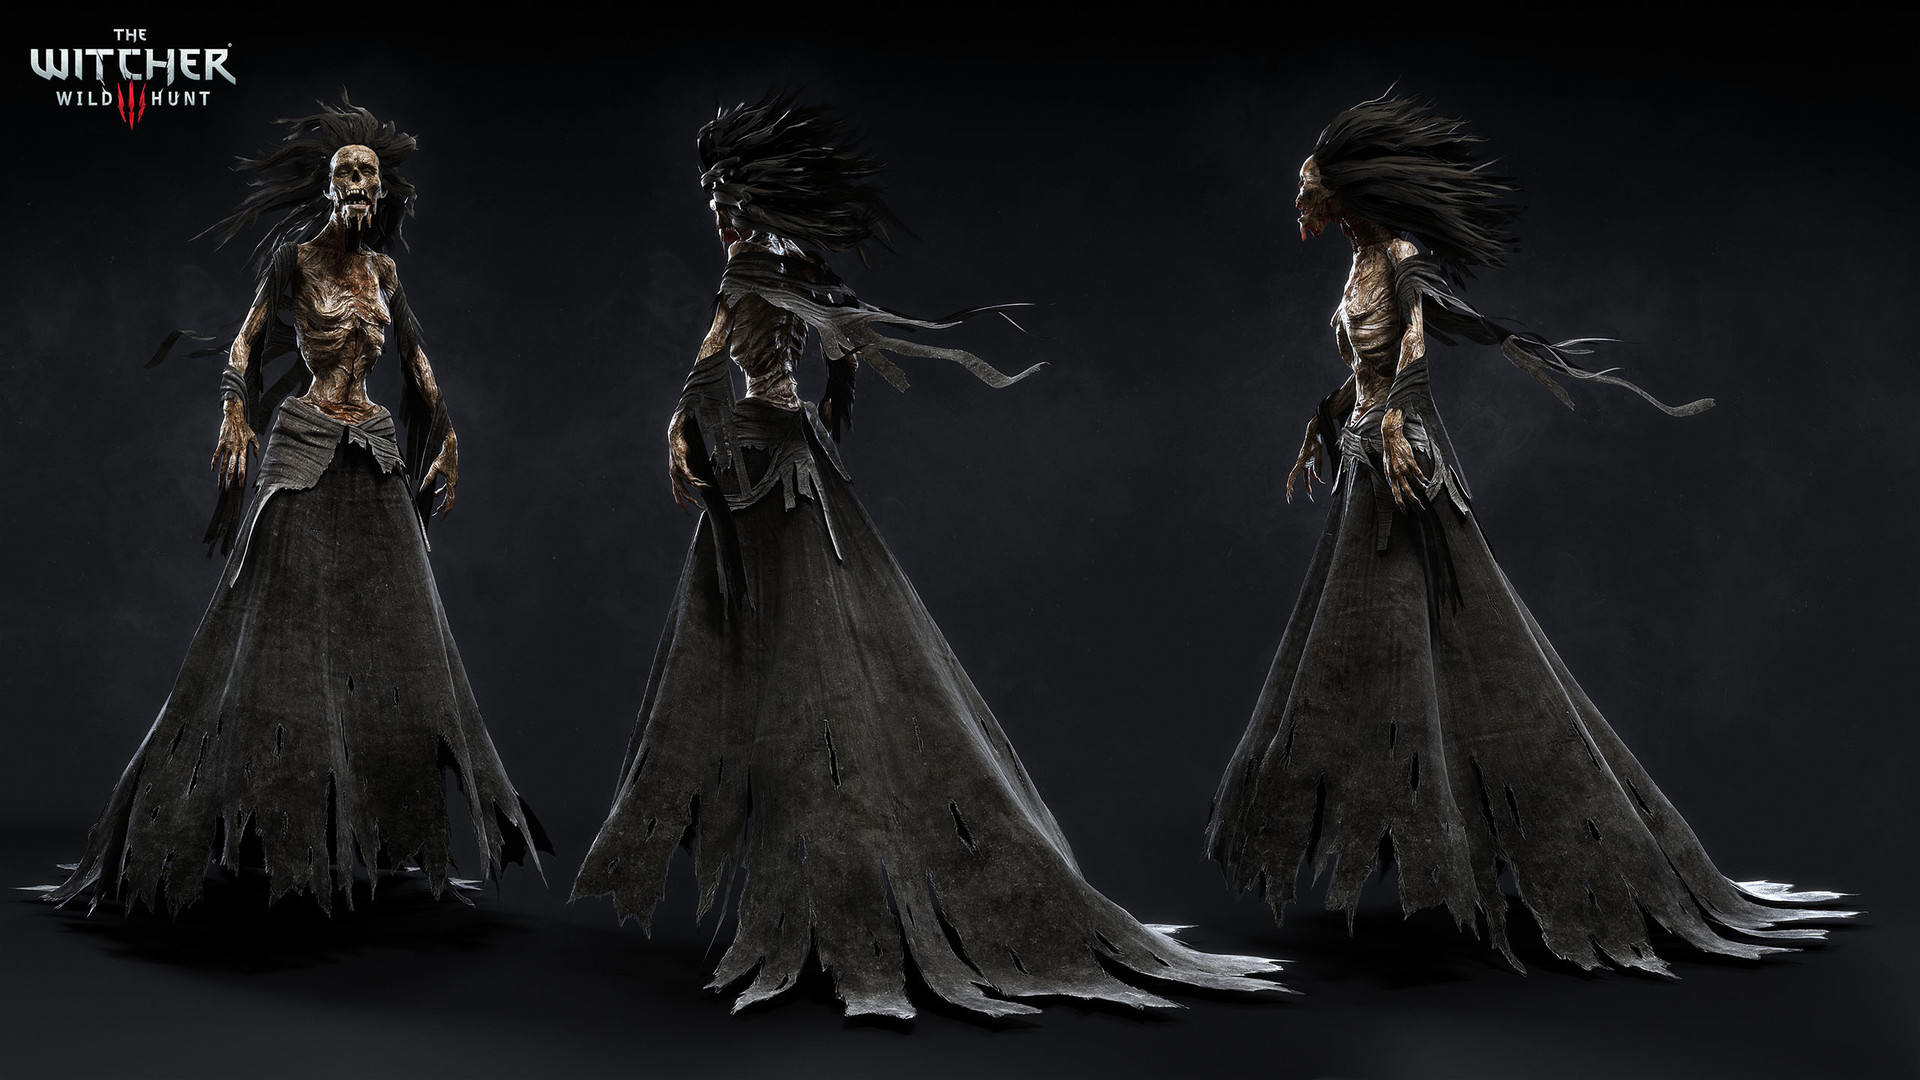 Witcher3 Character Art by Marcin Blaszczak